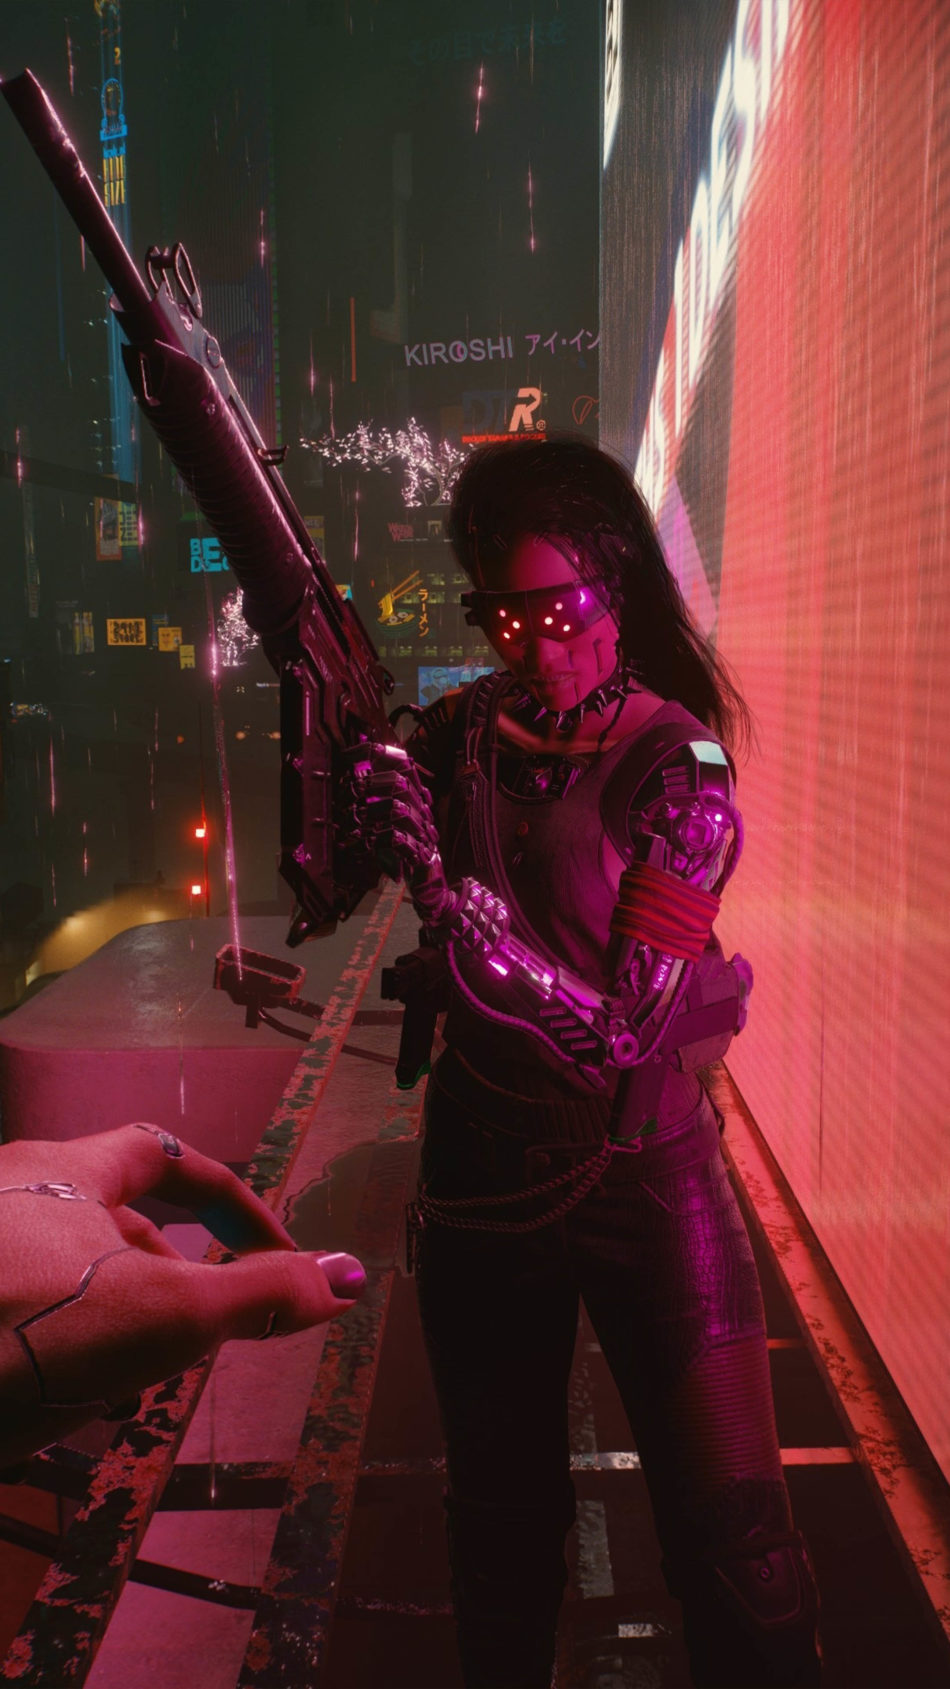 Cyberpunk 2077 2020 Game Poster 4K Ultra HD Mobile Wallpaper